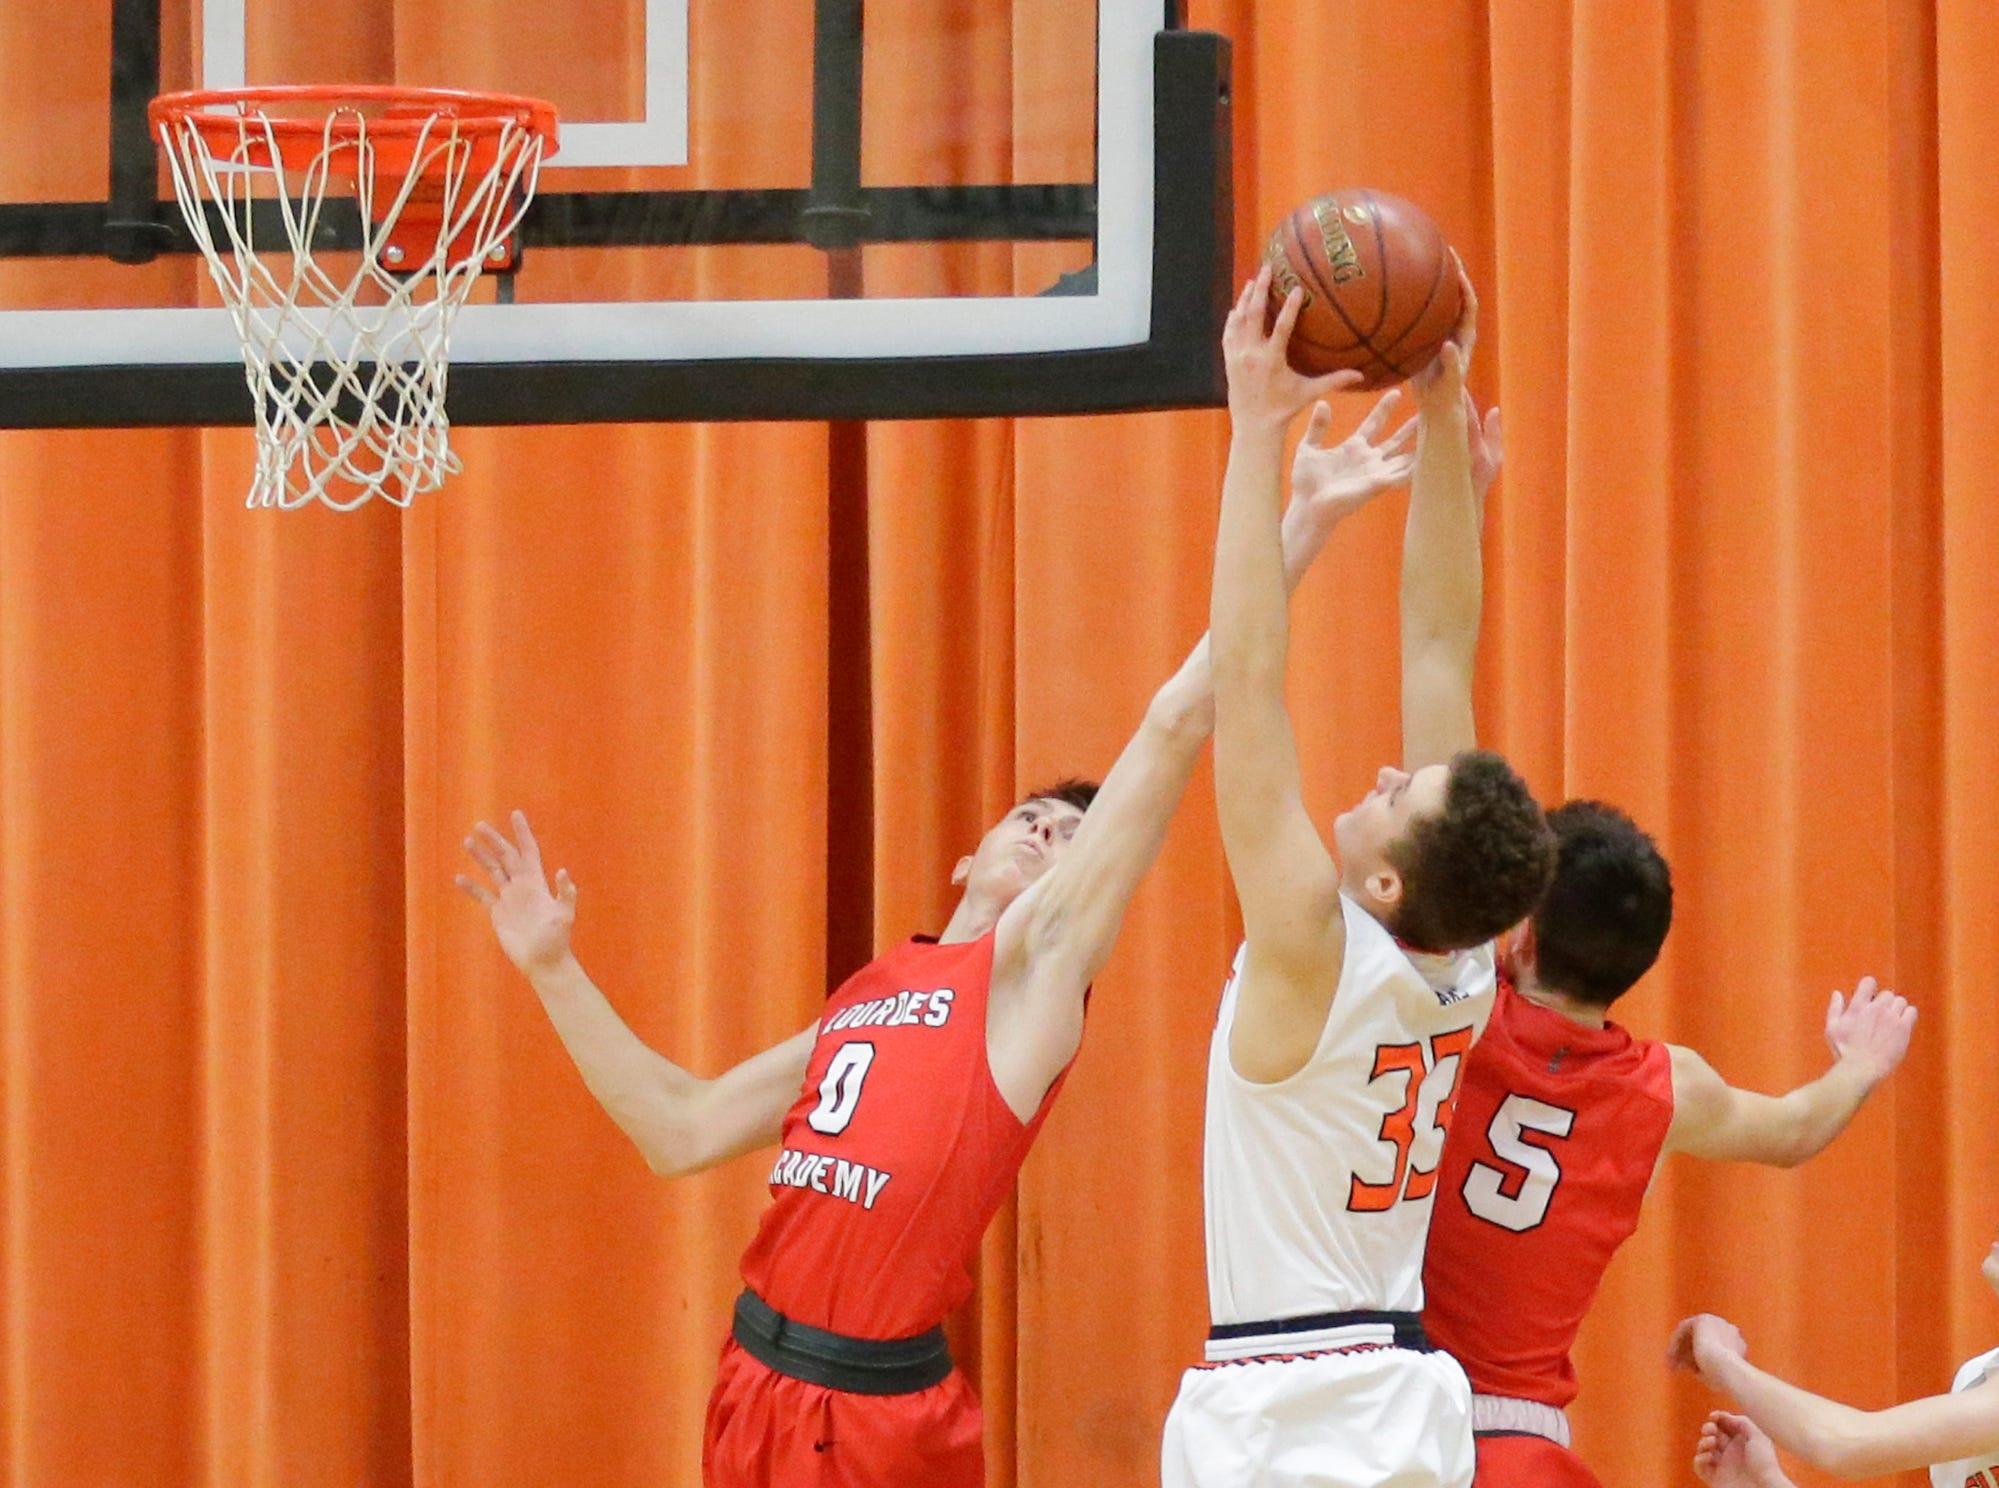 Oakfield High School boys basketball's Bart Bijl gets a rebound over Lourdes Academy's Hayden Jones (0) and Jack McKellips (5) during their game Thursday, January 24, 2019 in Oakfield. Lourdes Academy won the game 83-48. Doug Raflik/USA TODAY NETWORK-Wisconsin